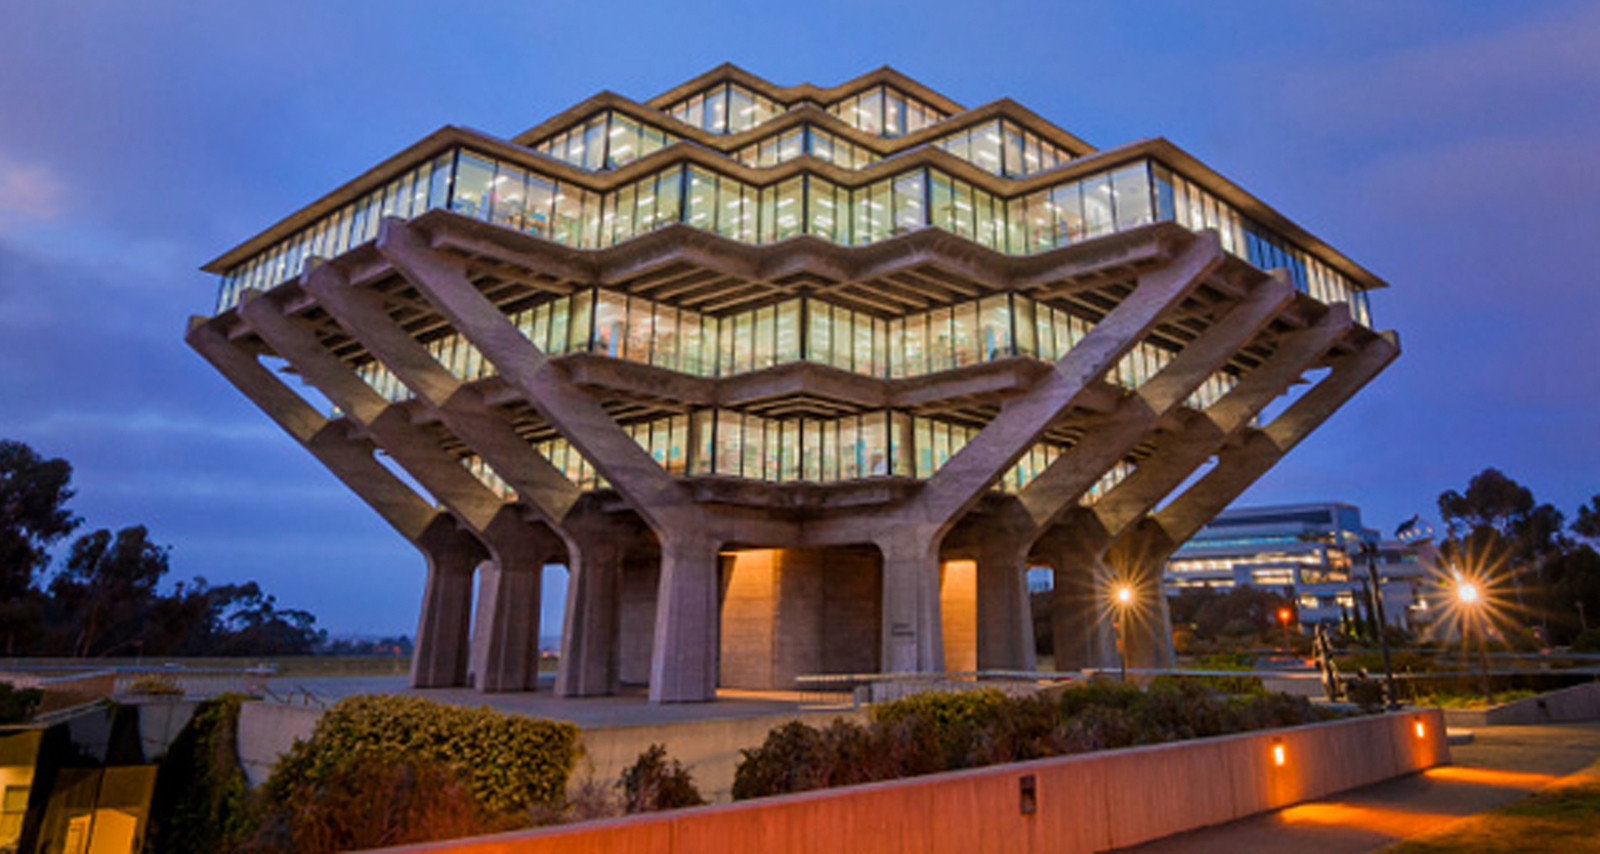 UCSD 2017秋季数据科学项目闪亮登场!